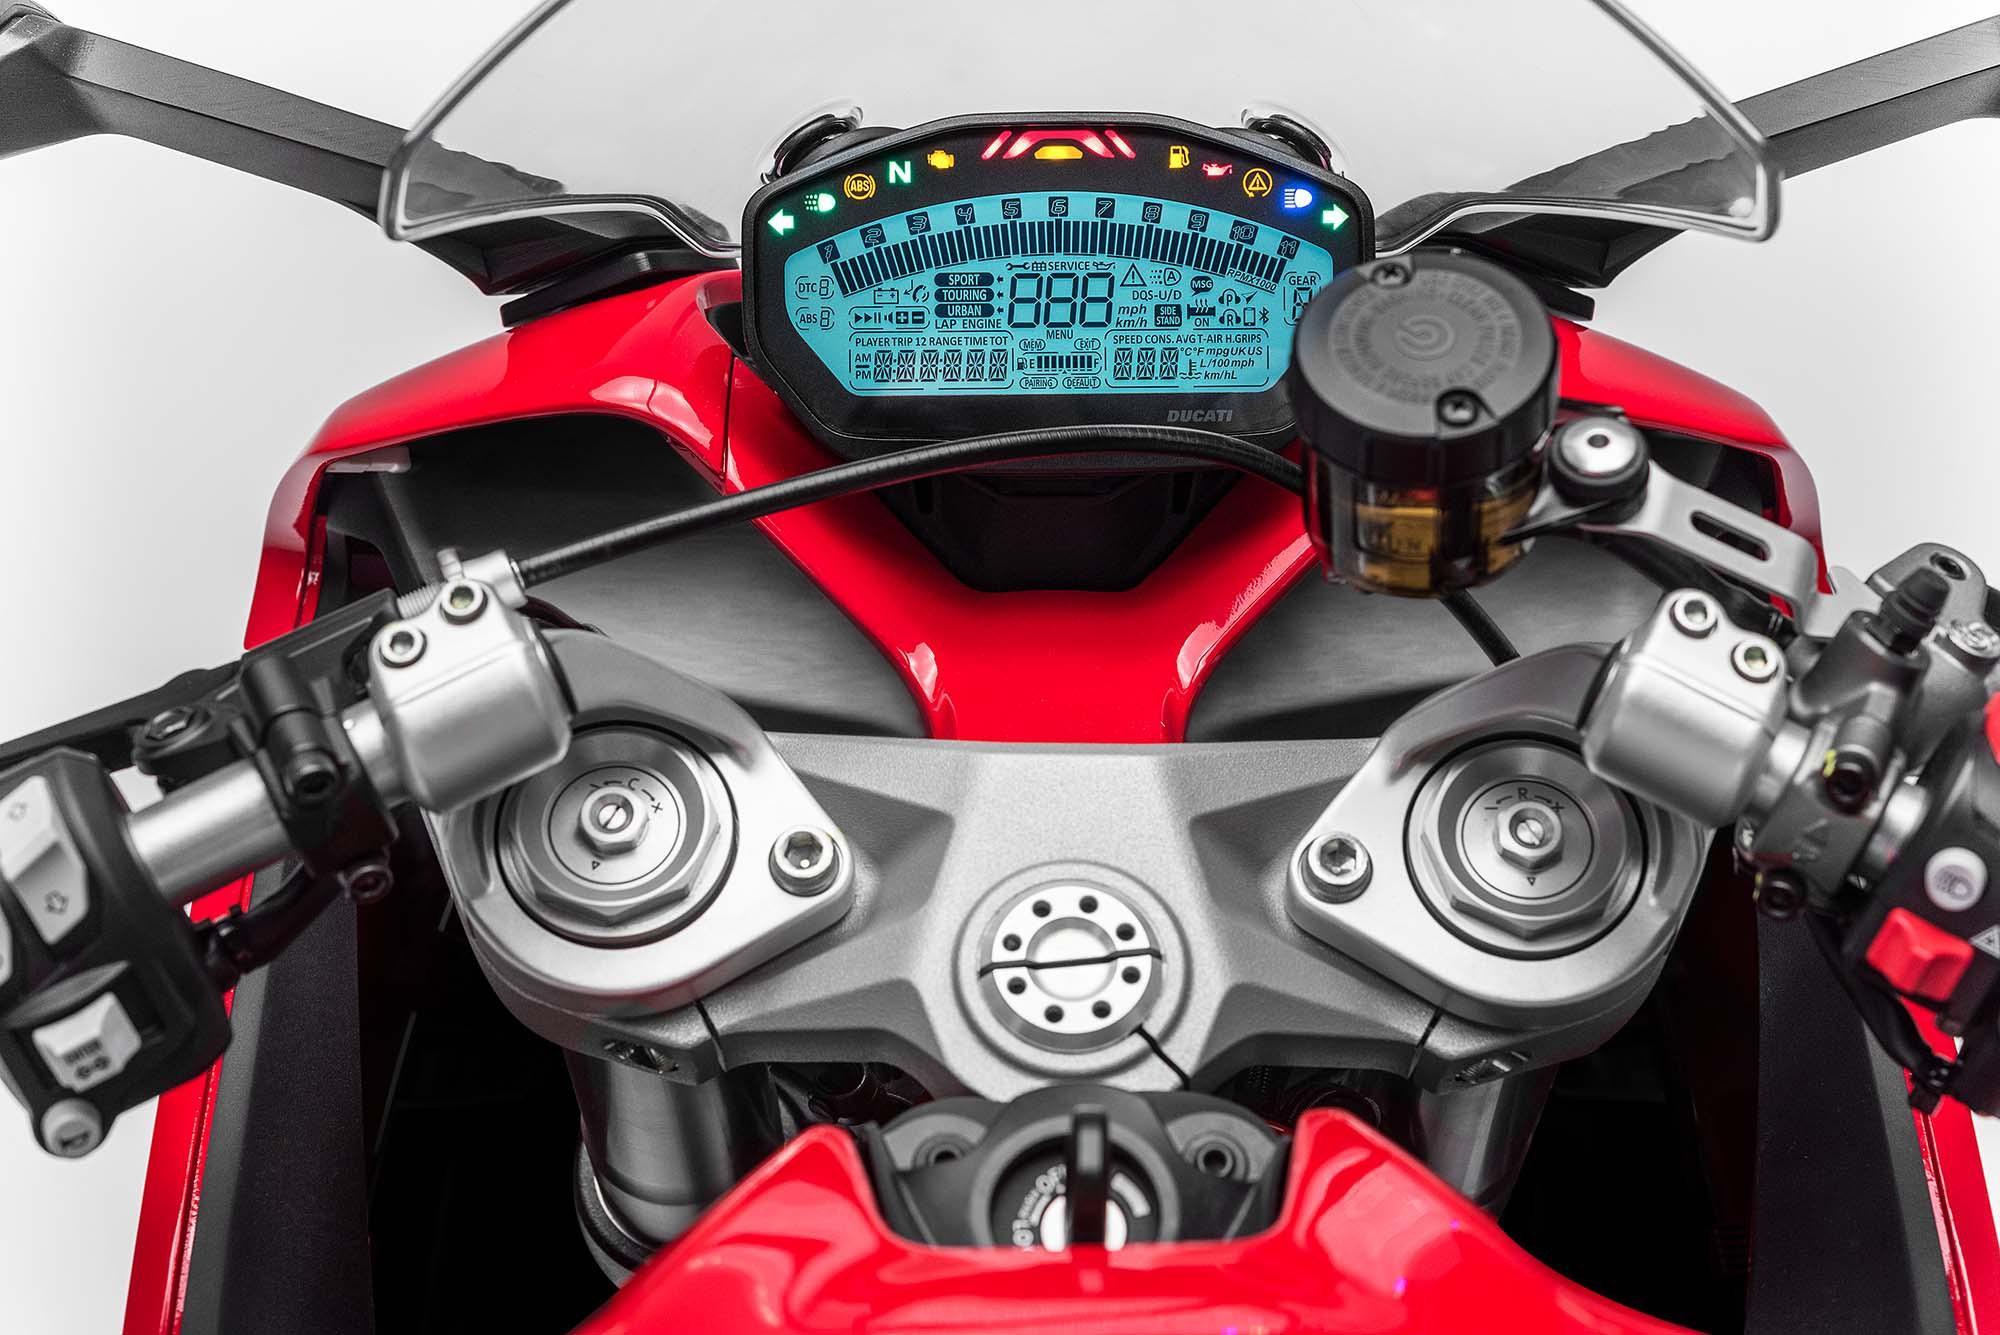 2017 Ducati SuperSport - The Sport Bike Returns - Asphalt & Rubber